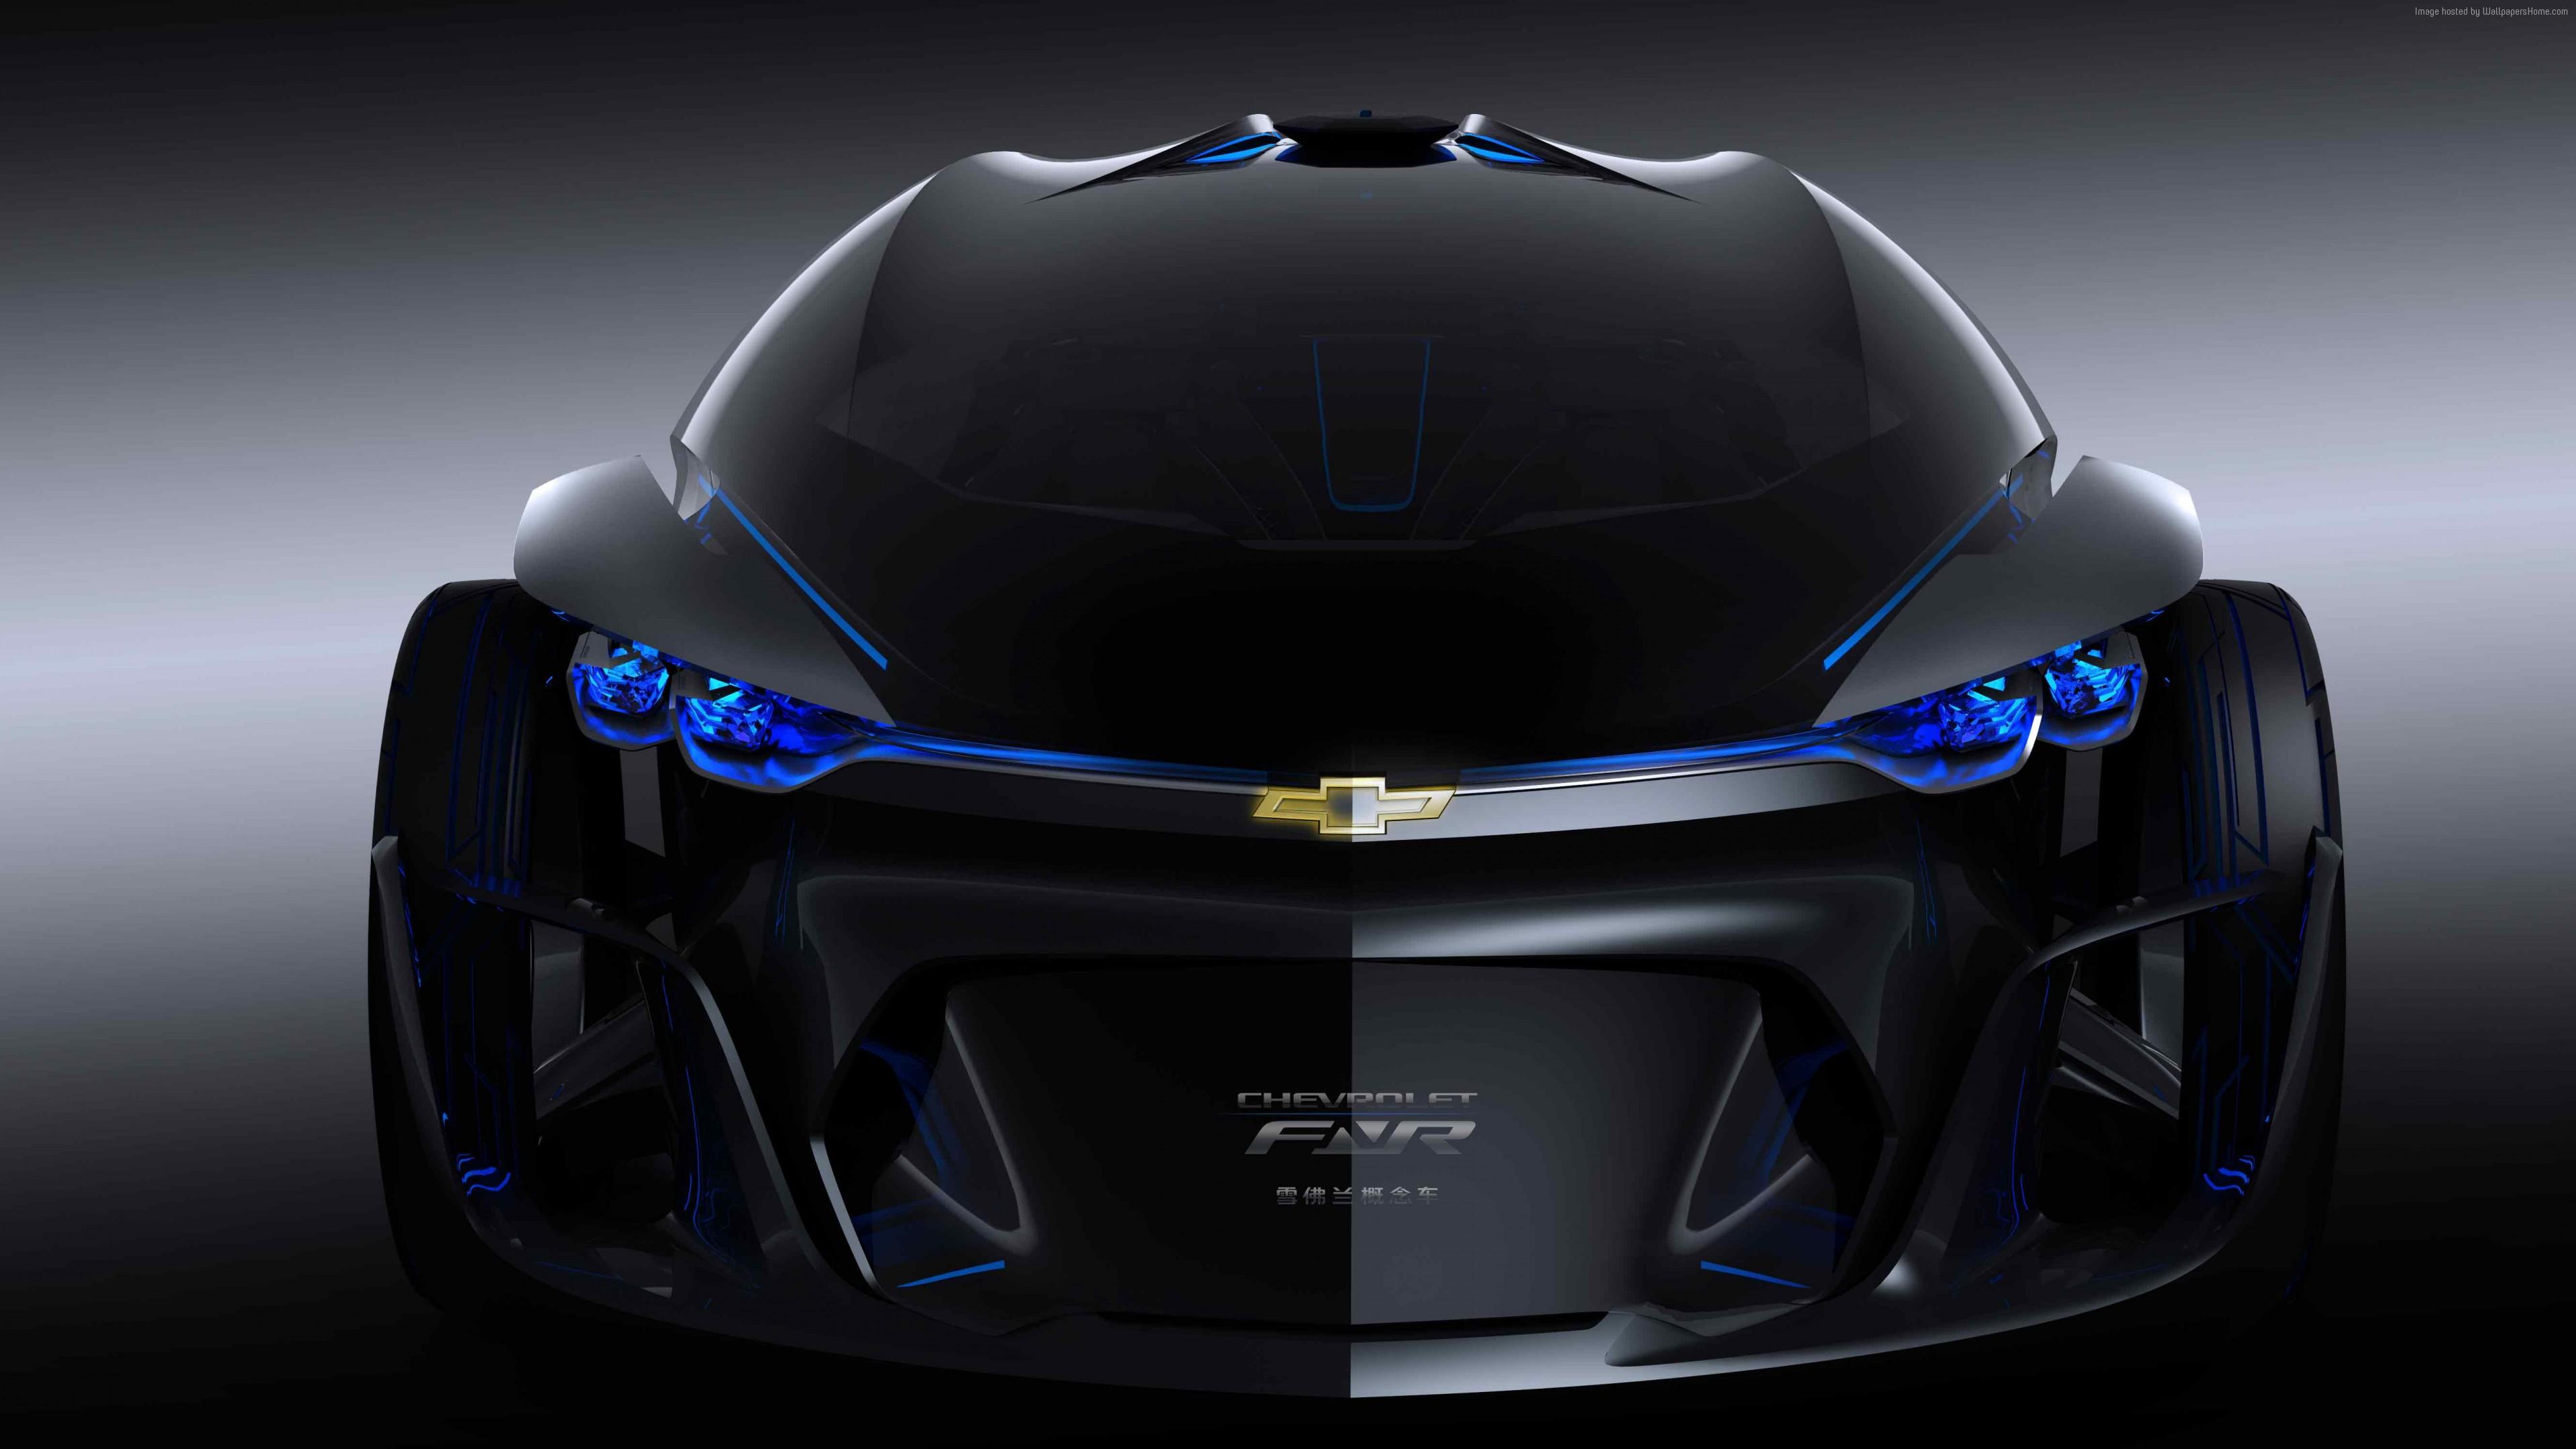 chevrolet futuristic concept car 1539104626 - Chevrolet Futuristic Concept Car - concept cars wallpapers, cars wallpapers